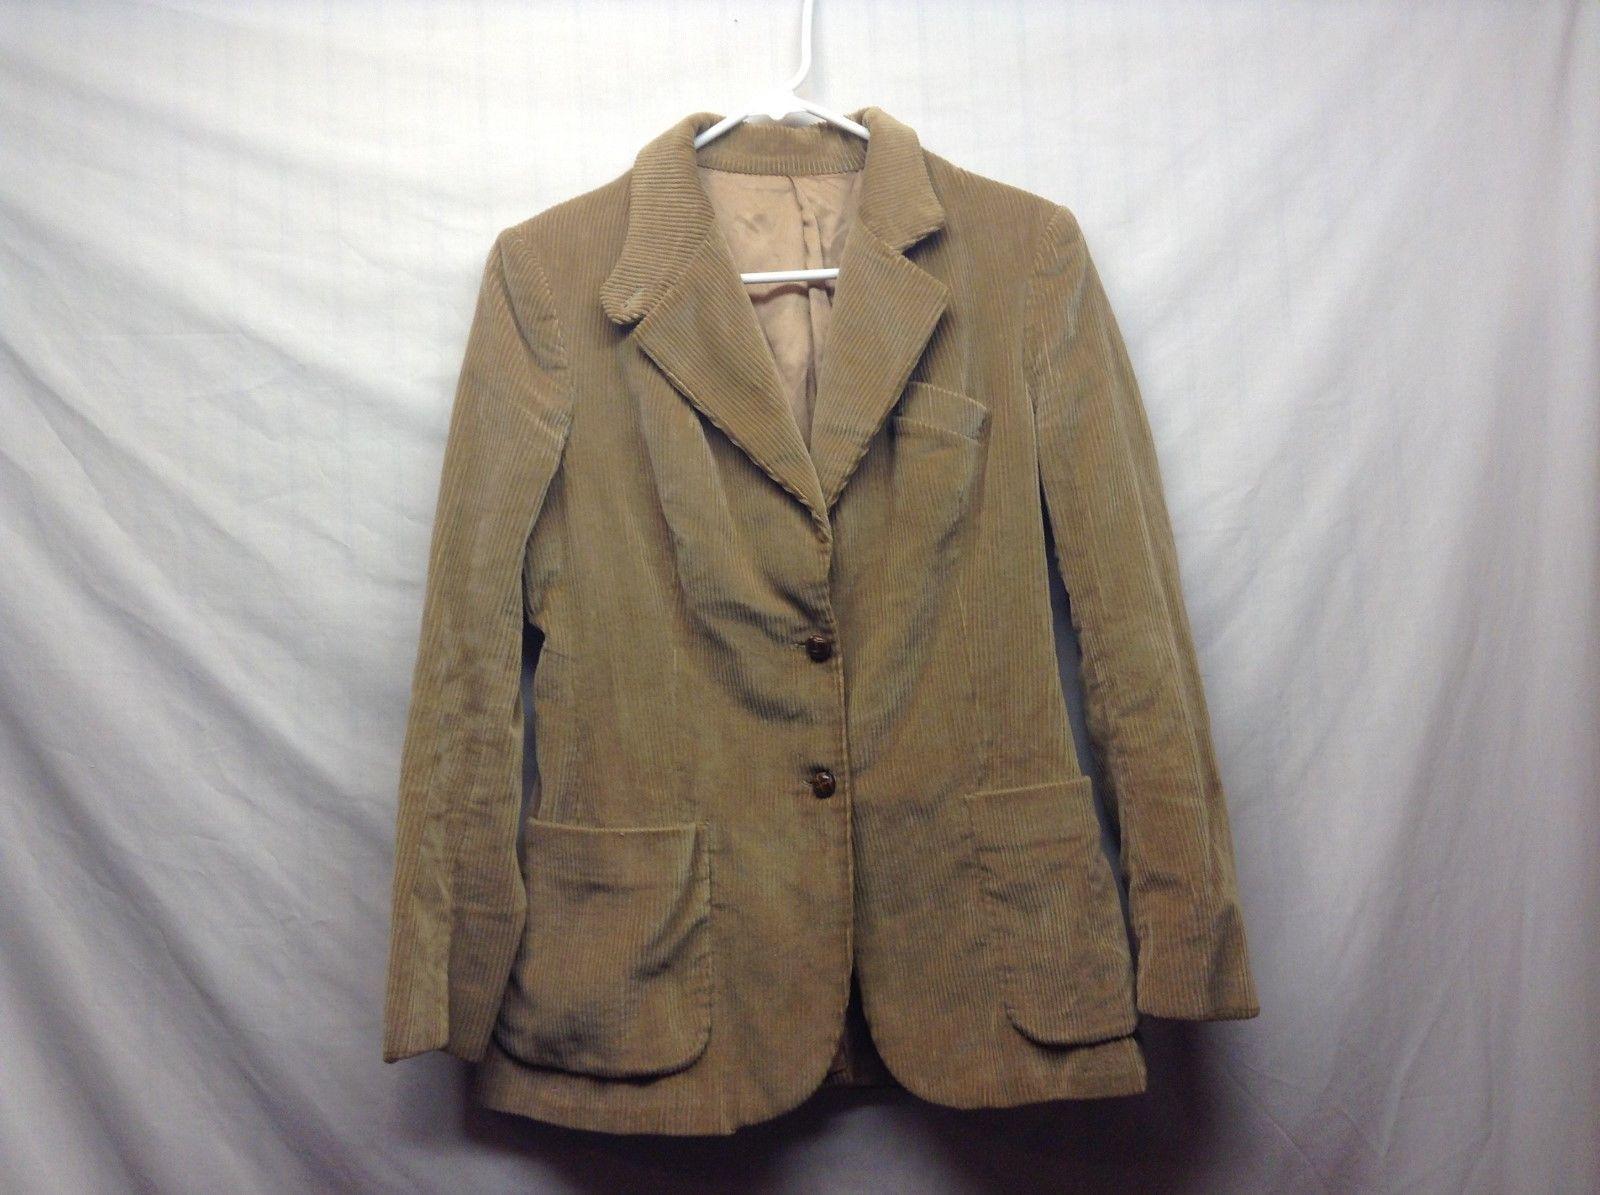 Sir for Her Vintage Corduroy Jacket